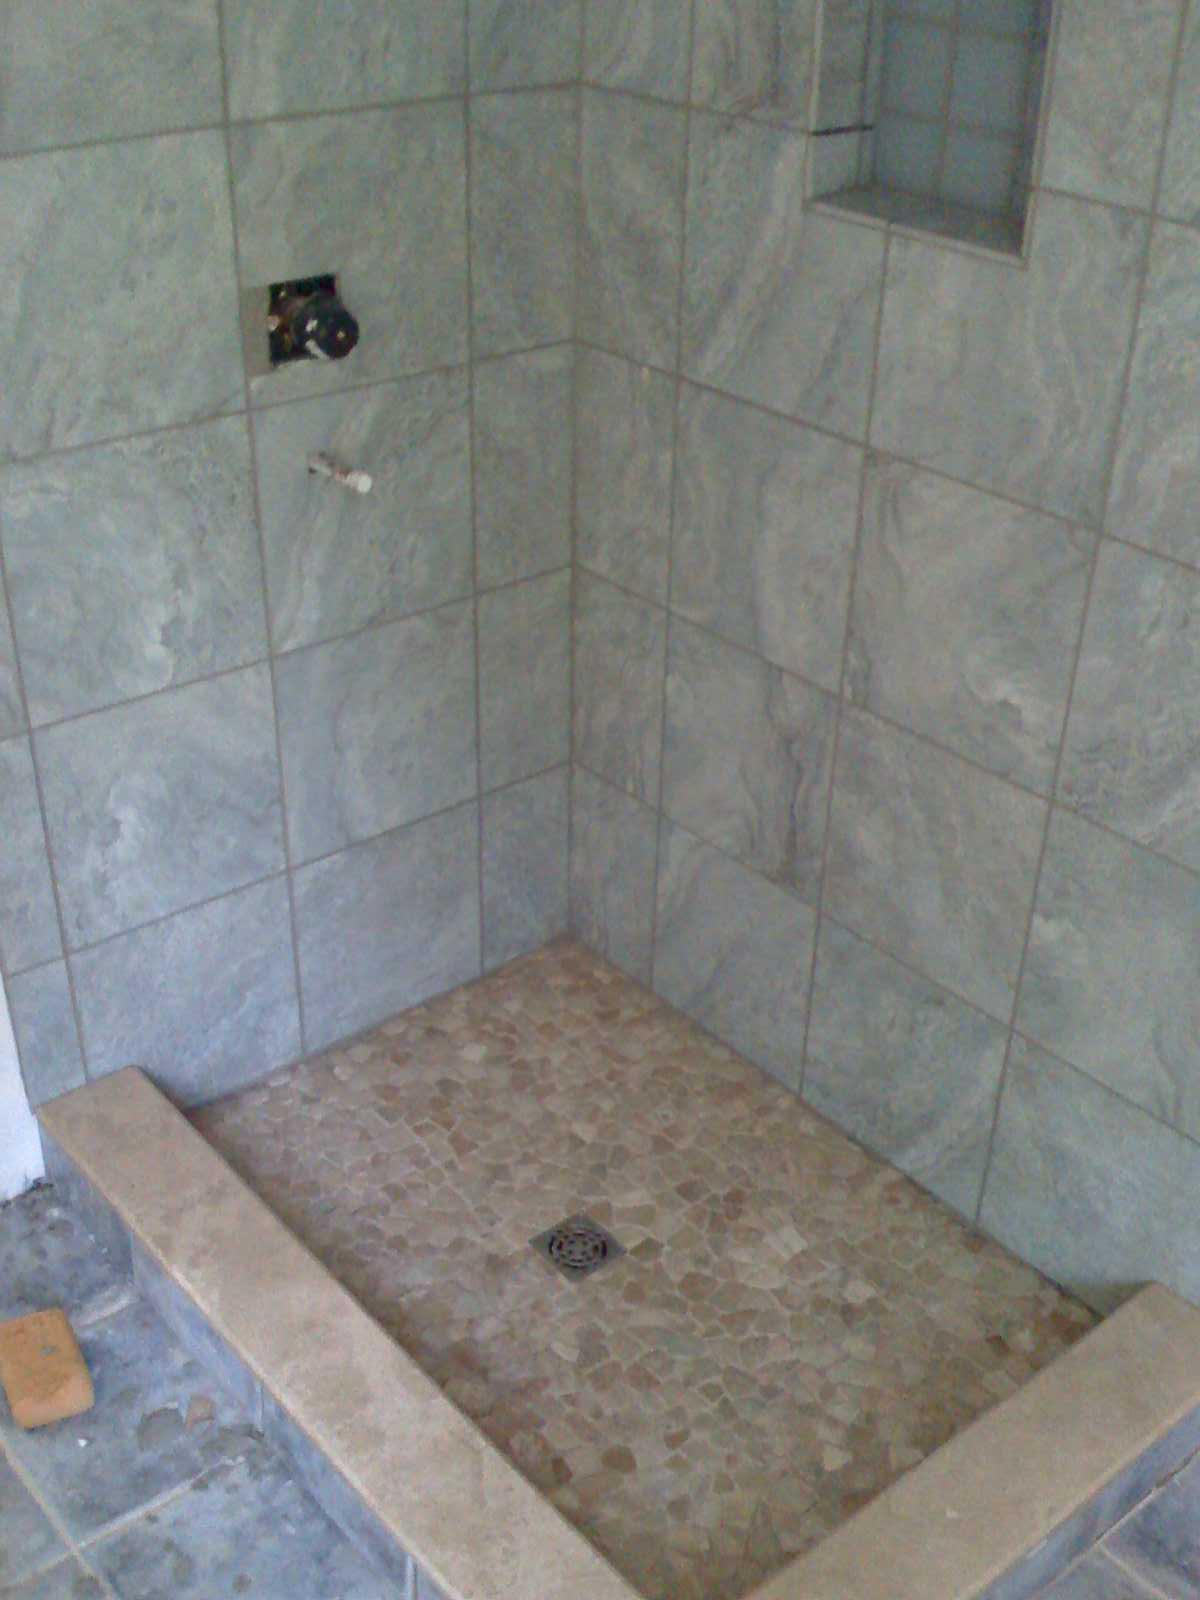 Oceanside ceramic tile company kill devil hills nc 27948 angie 39 s list - Pictures tile flooring ...